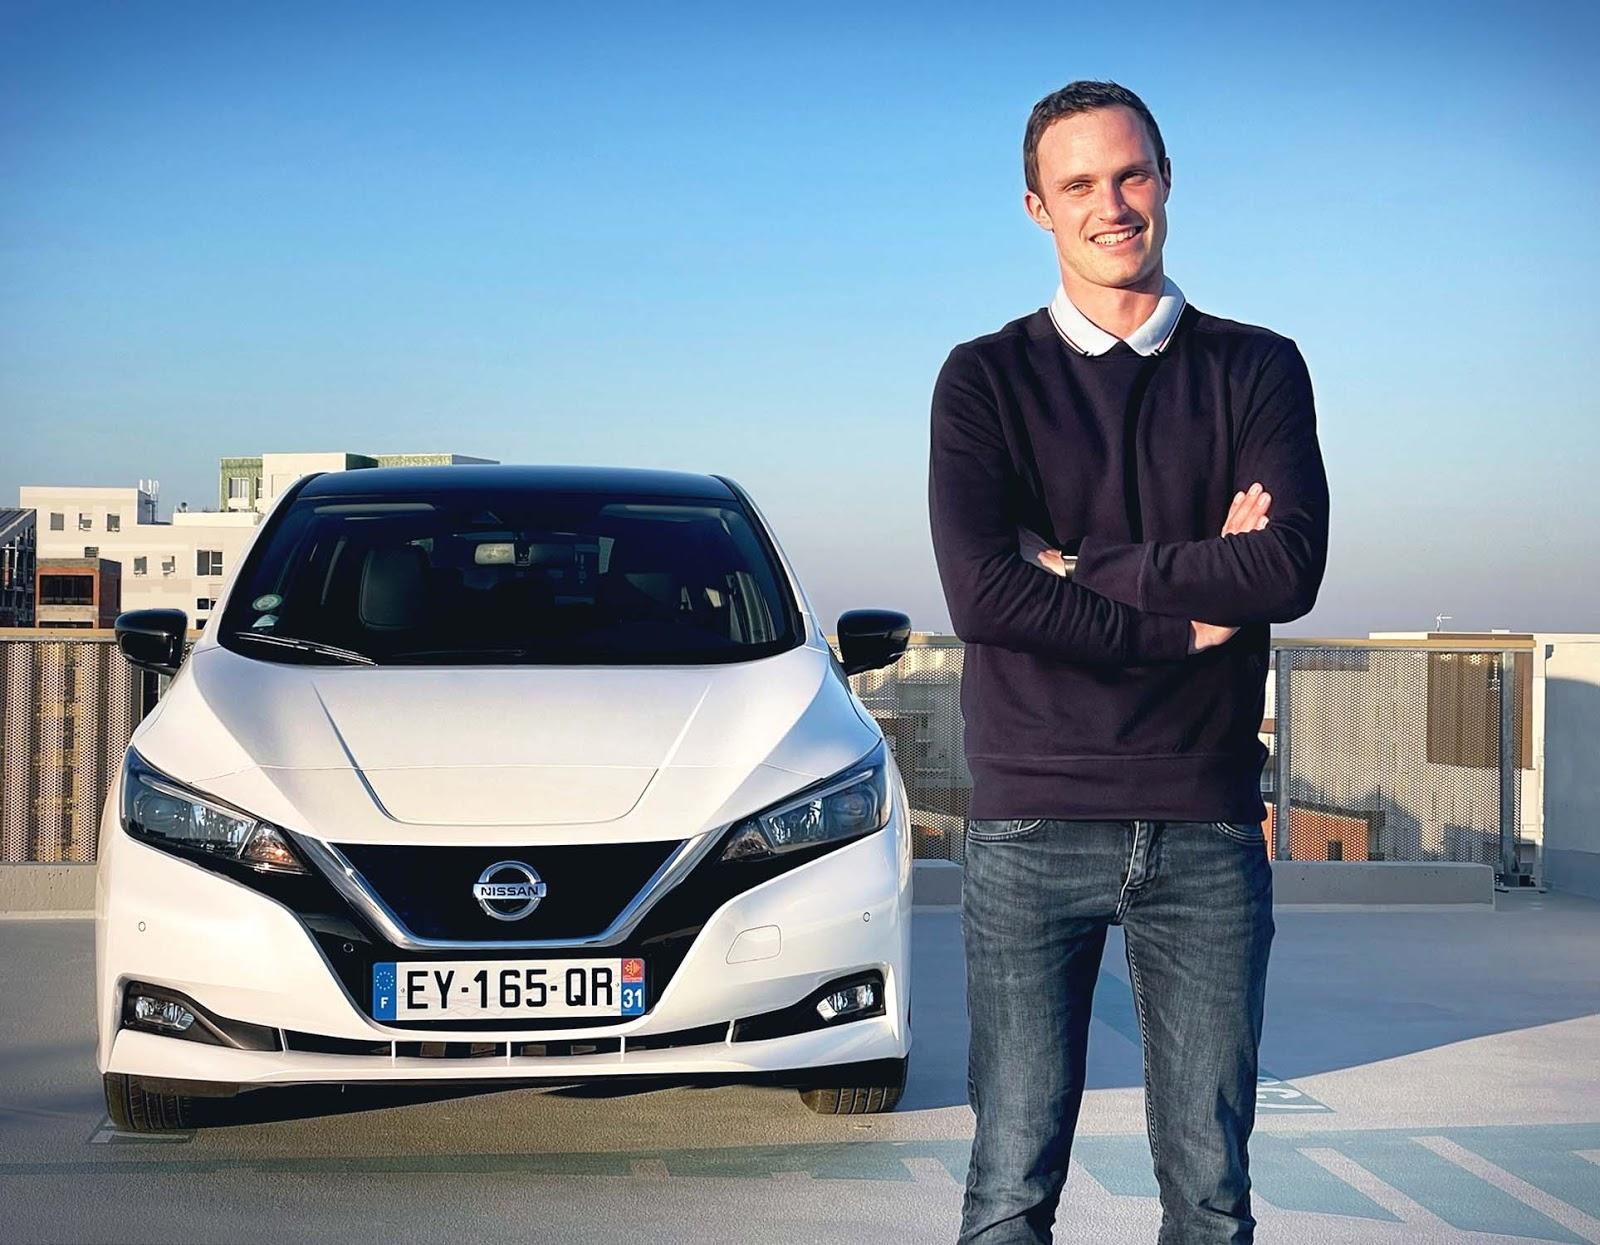 Picture2B12B252812529 1 Nissan : Το 70% των Ευρωπαίων οδηγών, σκέφτεται σοβαρά το επόμενο τους αυτοκίνητο, να είναι ηλεκτρικό Electric cars, electric vehicles, EV, Nissan, ειδήσεις, ηλεκτρικά, ηλεκτροκινηση